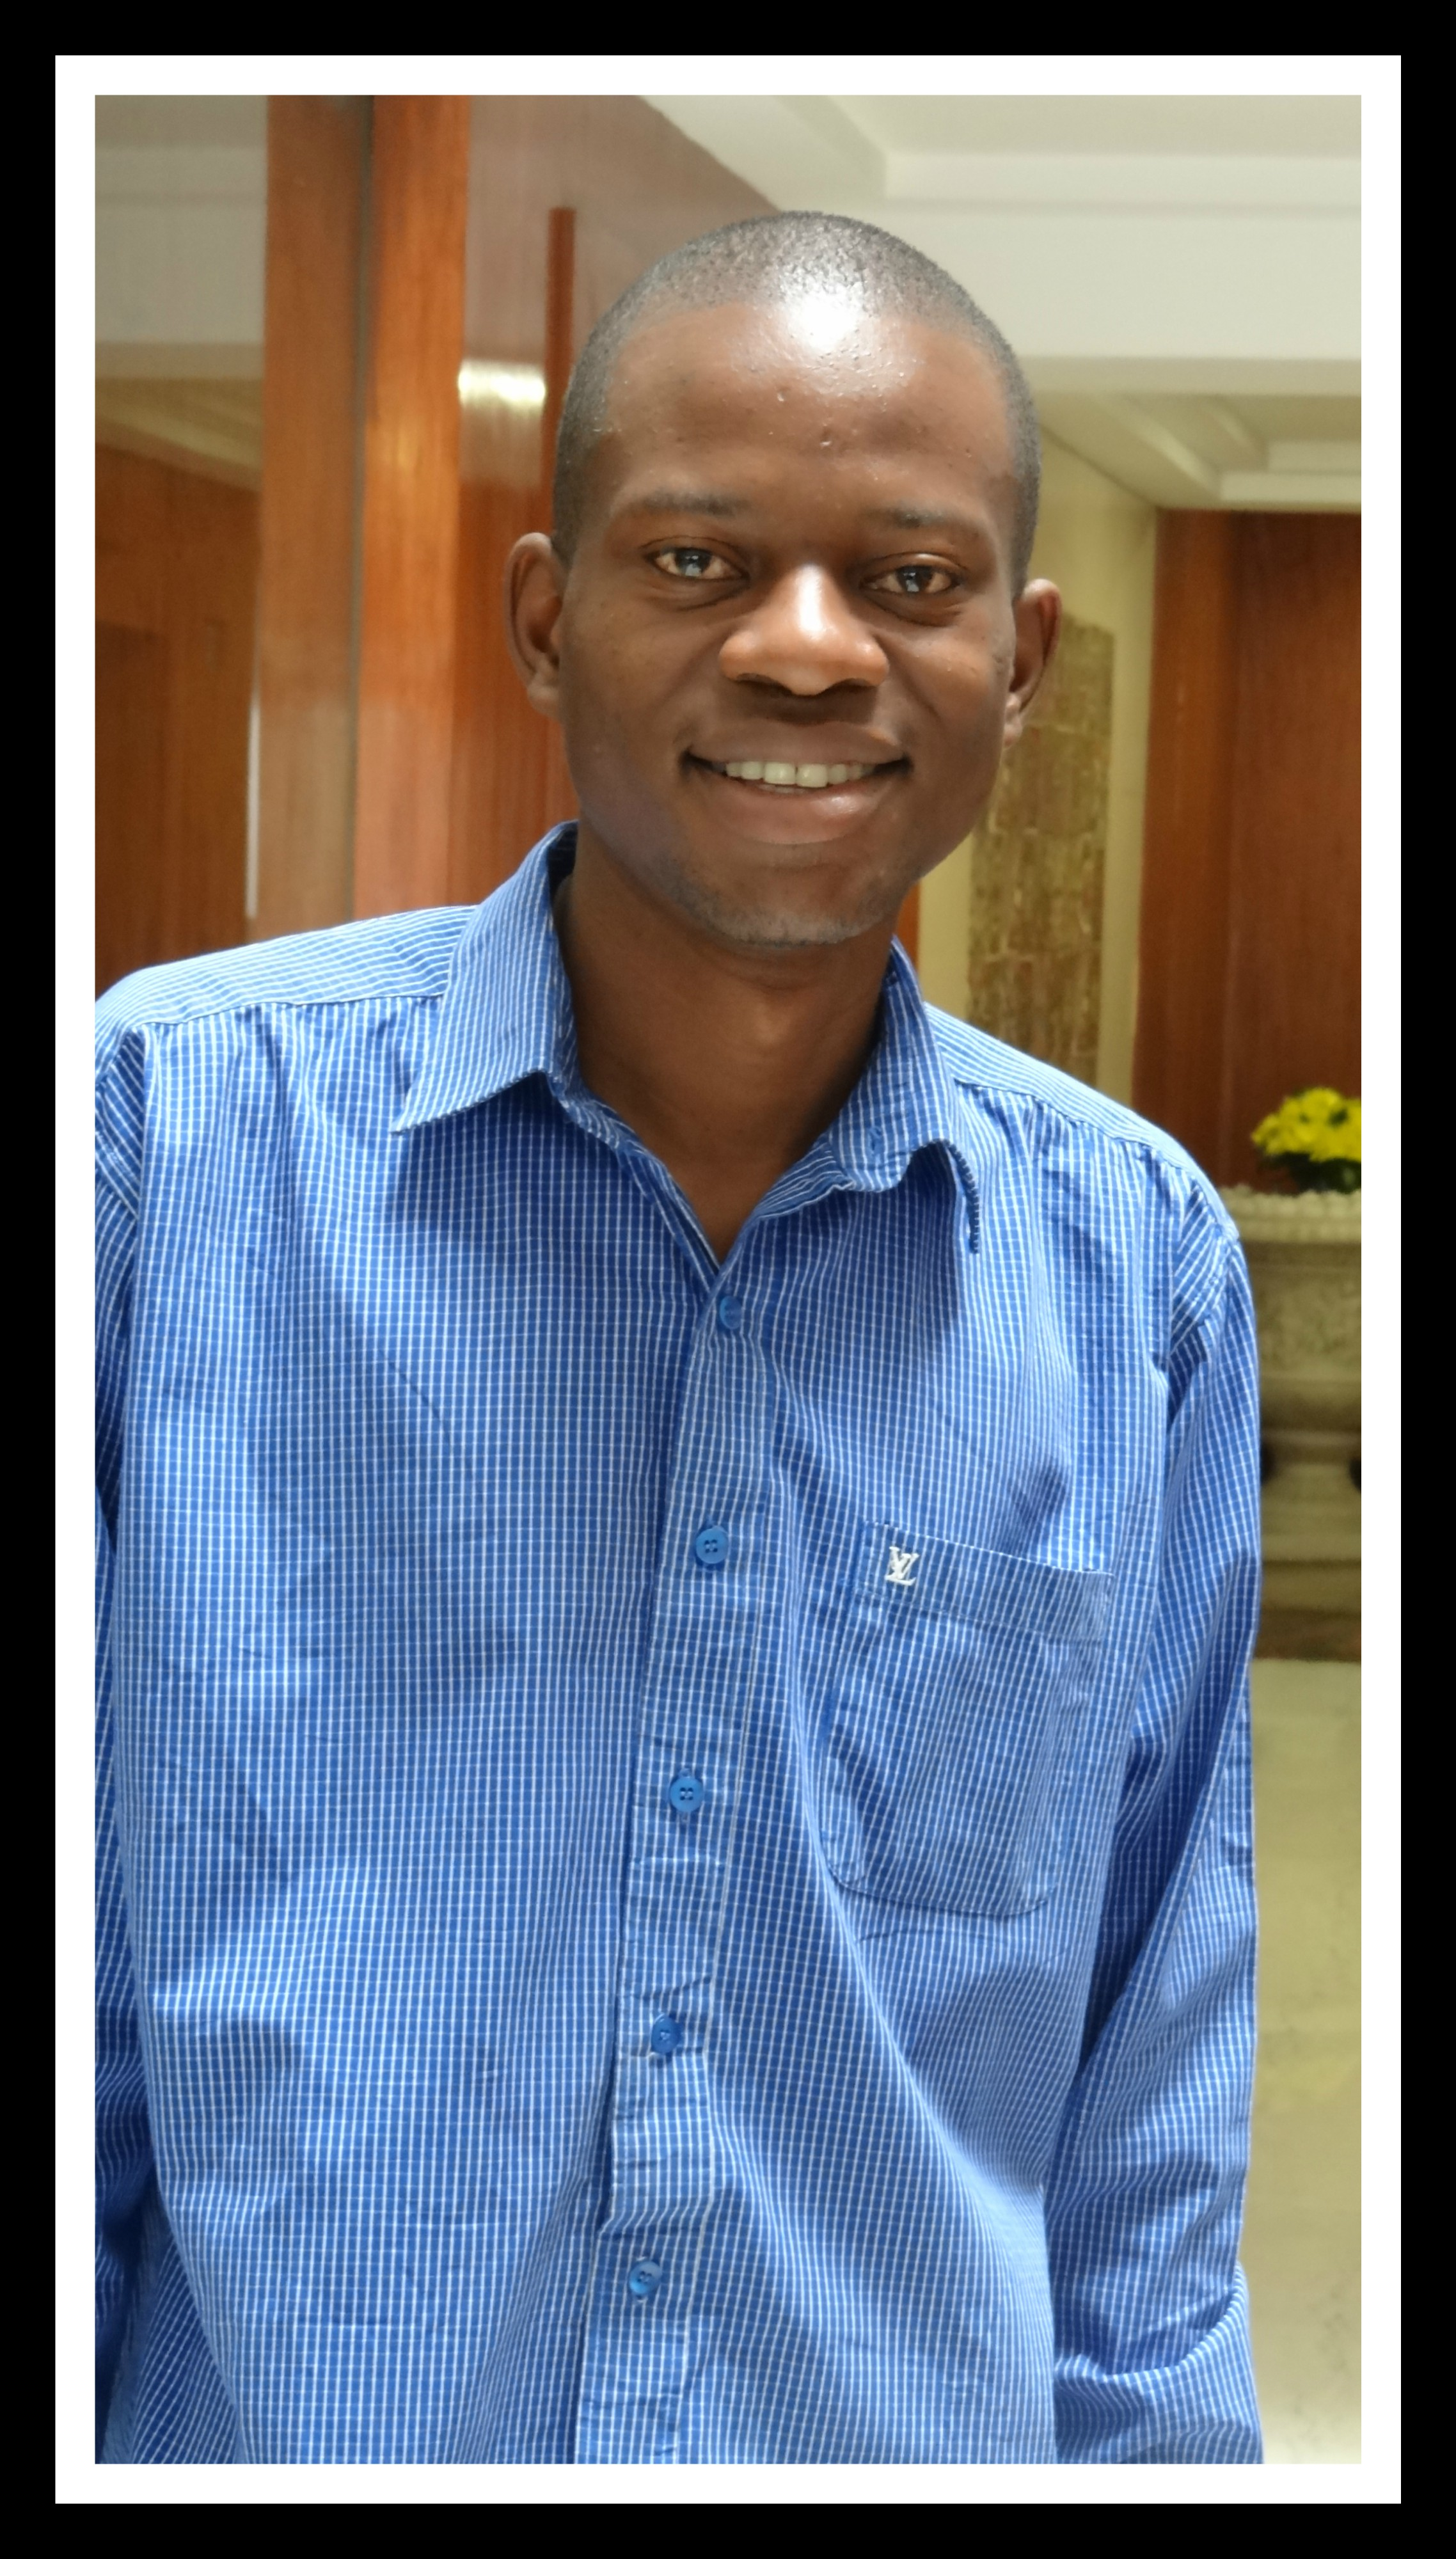 Keane Matenga